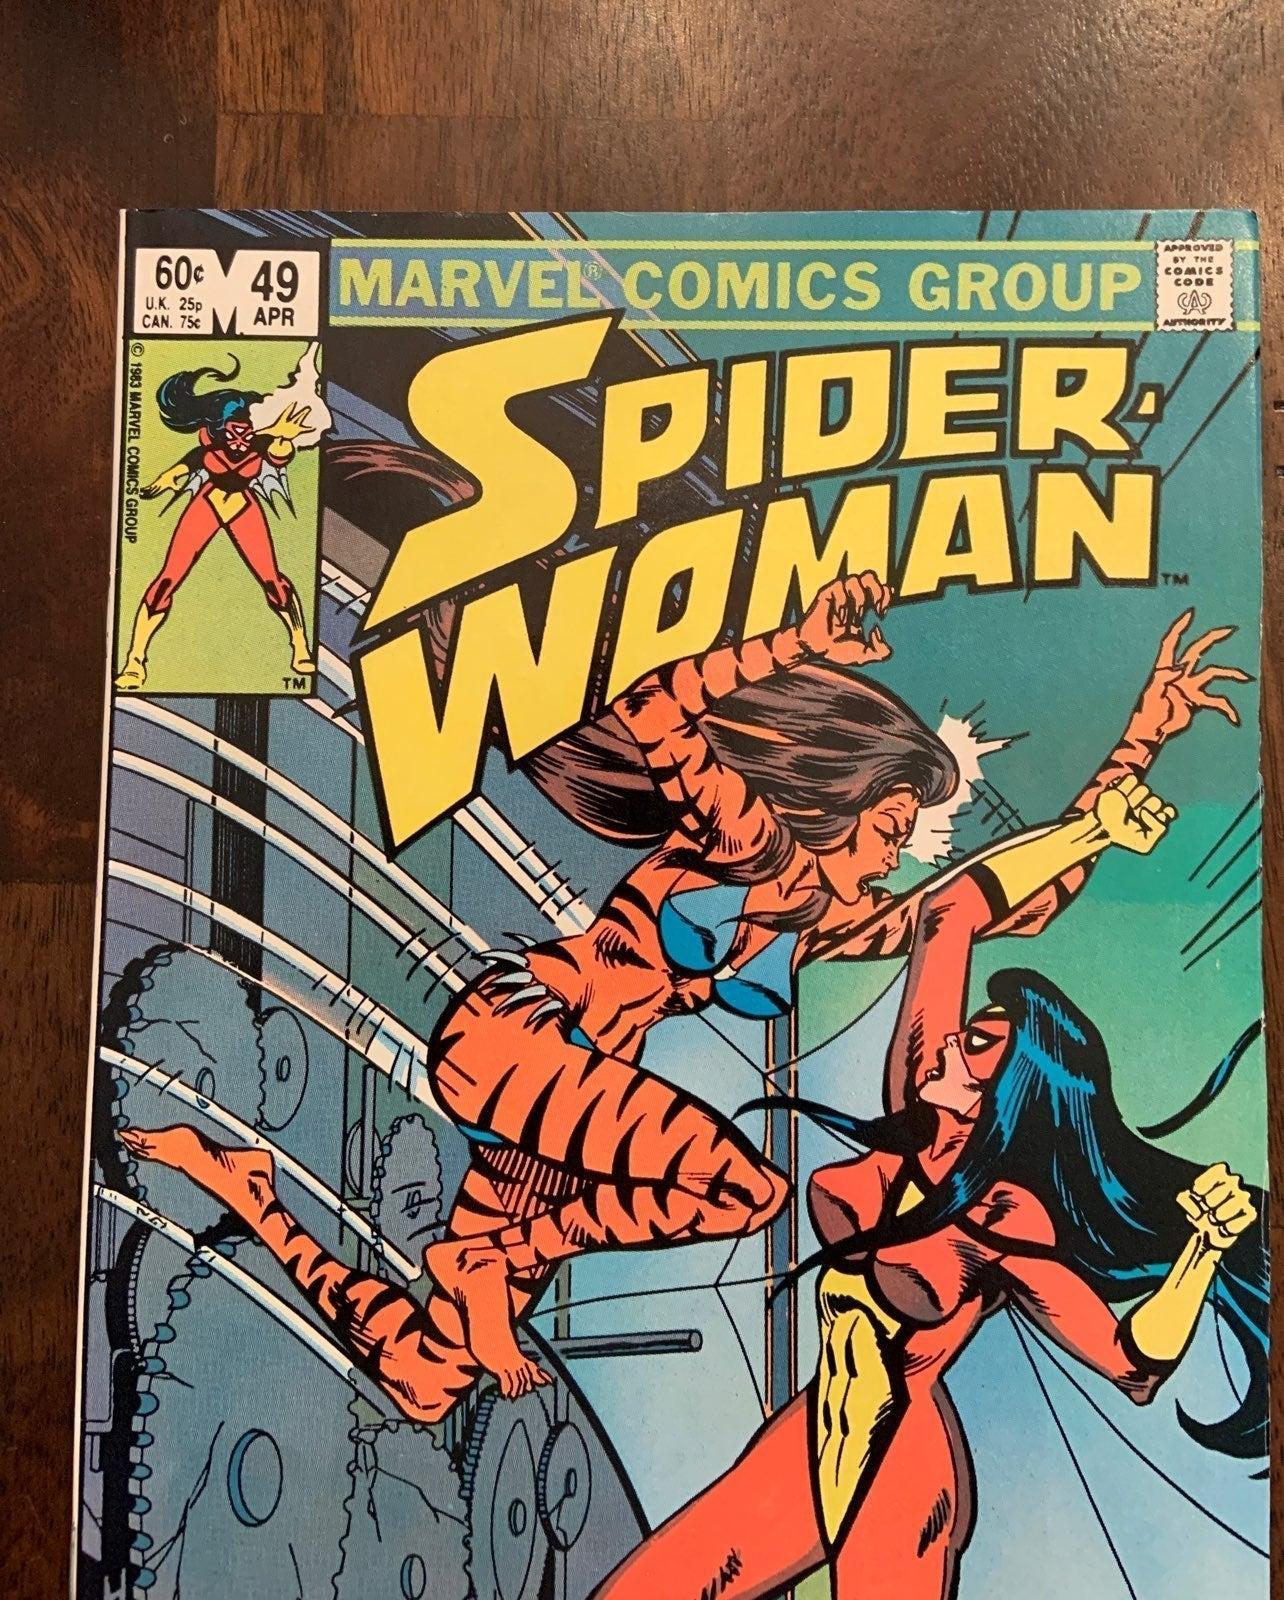 Spider-woman #49